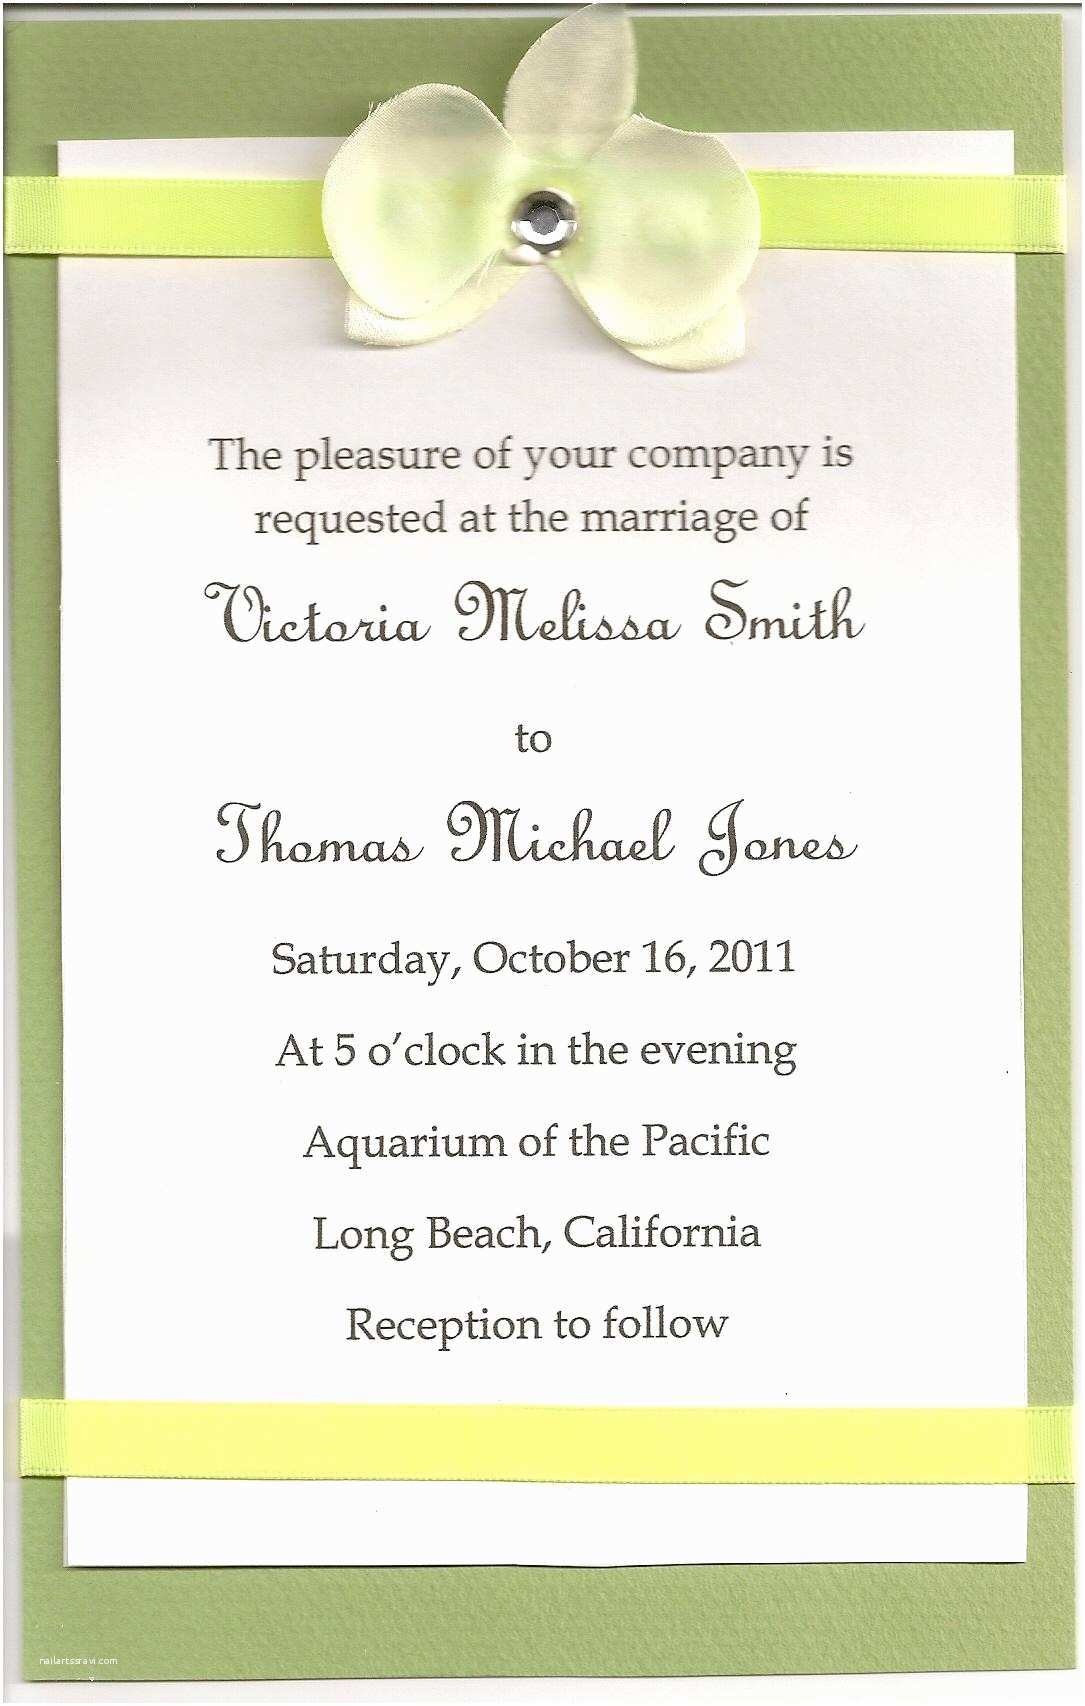 What To Put On Wedding Invitations Diy Wedding Invitations Simple Wedding Invitations